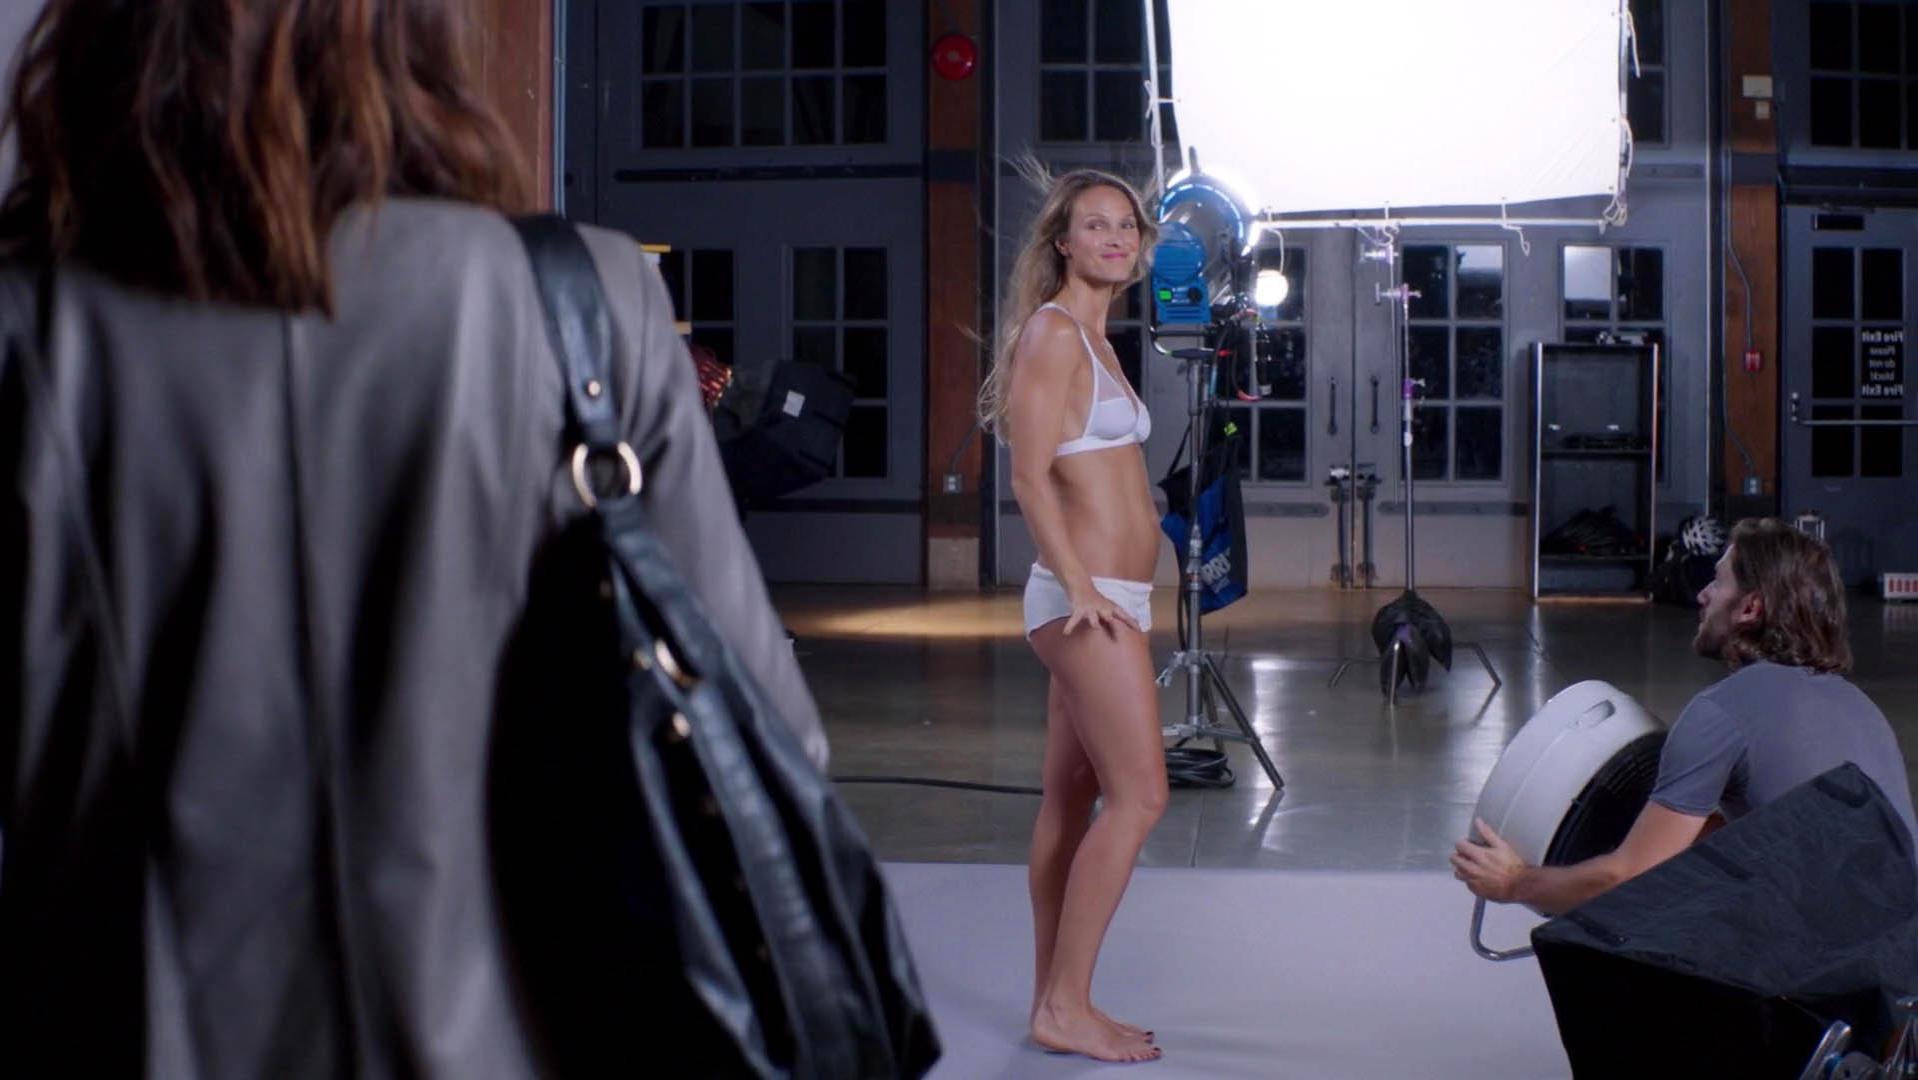 Deborah francois nude scene in mes cheres etudes - 3 8